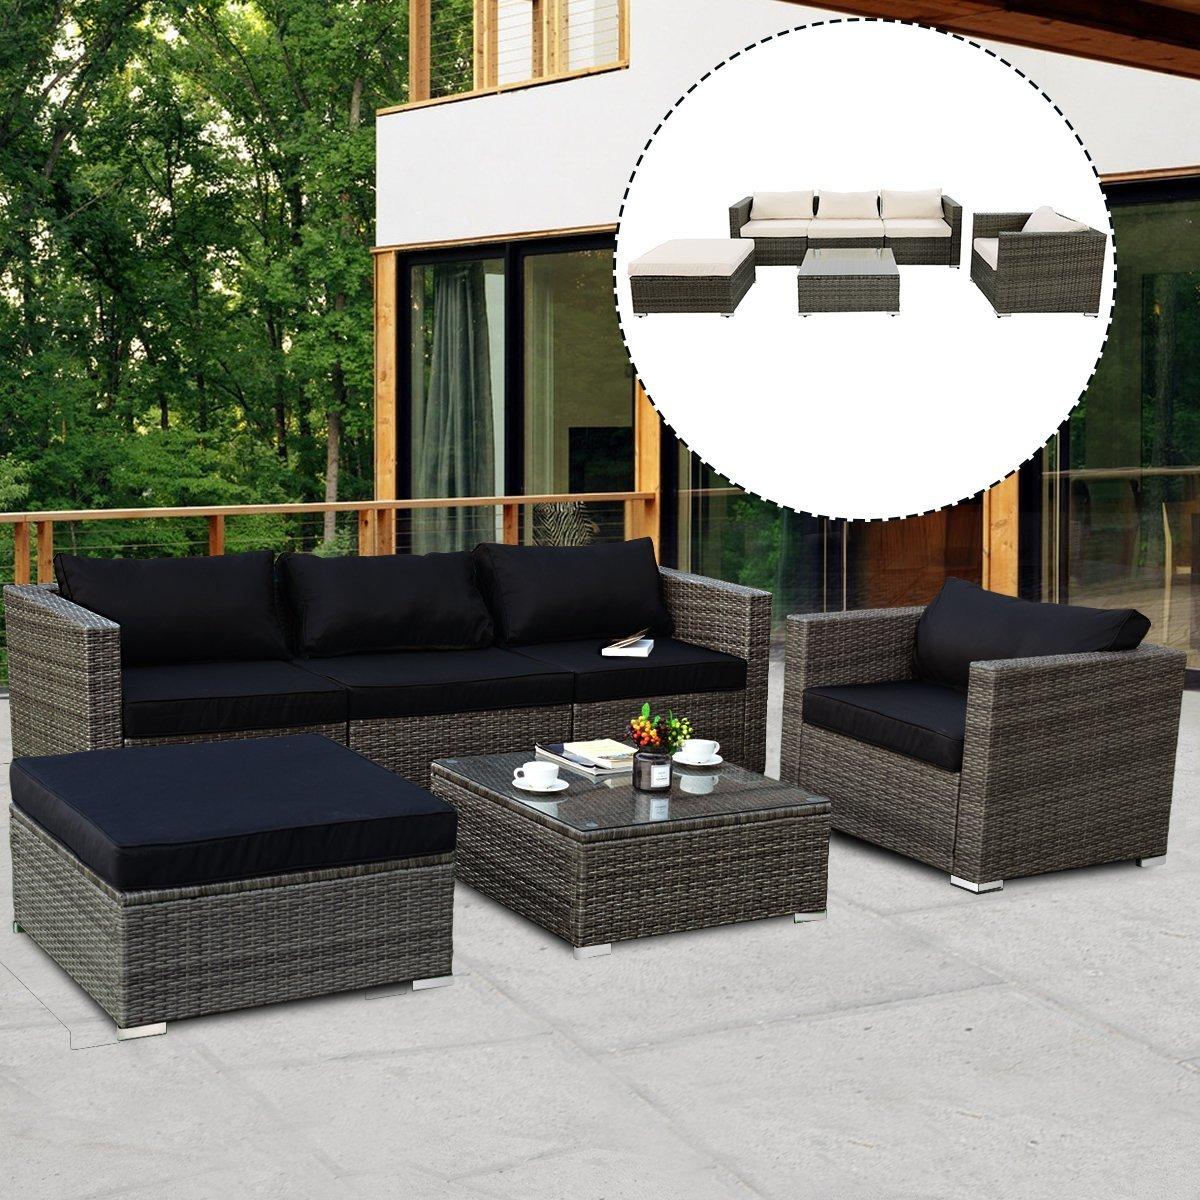 Get Quotations · TANGKULA 6PCs Patio Rattan Furniture Set Modern Outdoor  Garden Lawn Wicker Rattan Sofa Set PE Gray